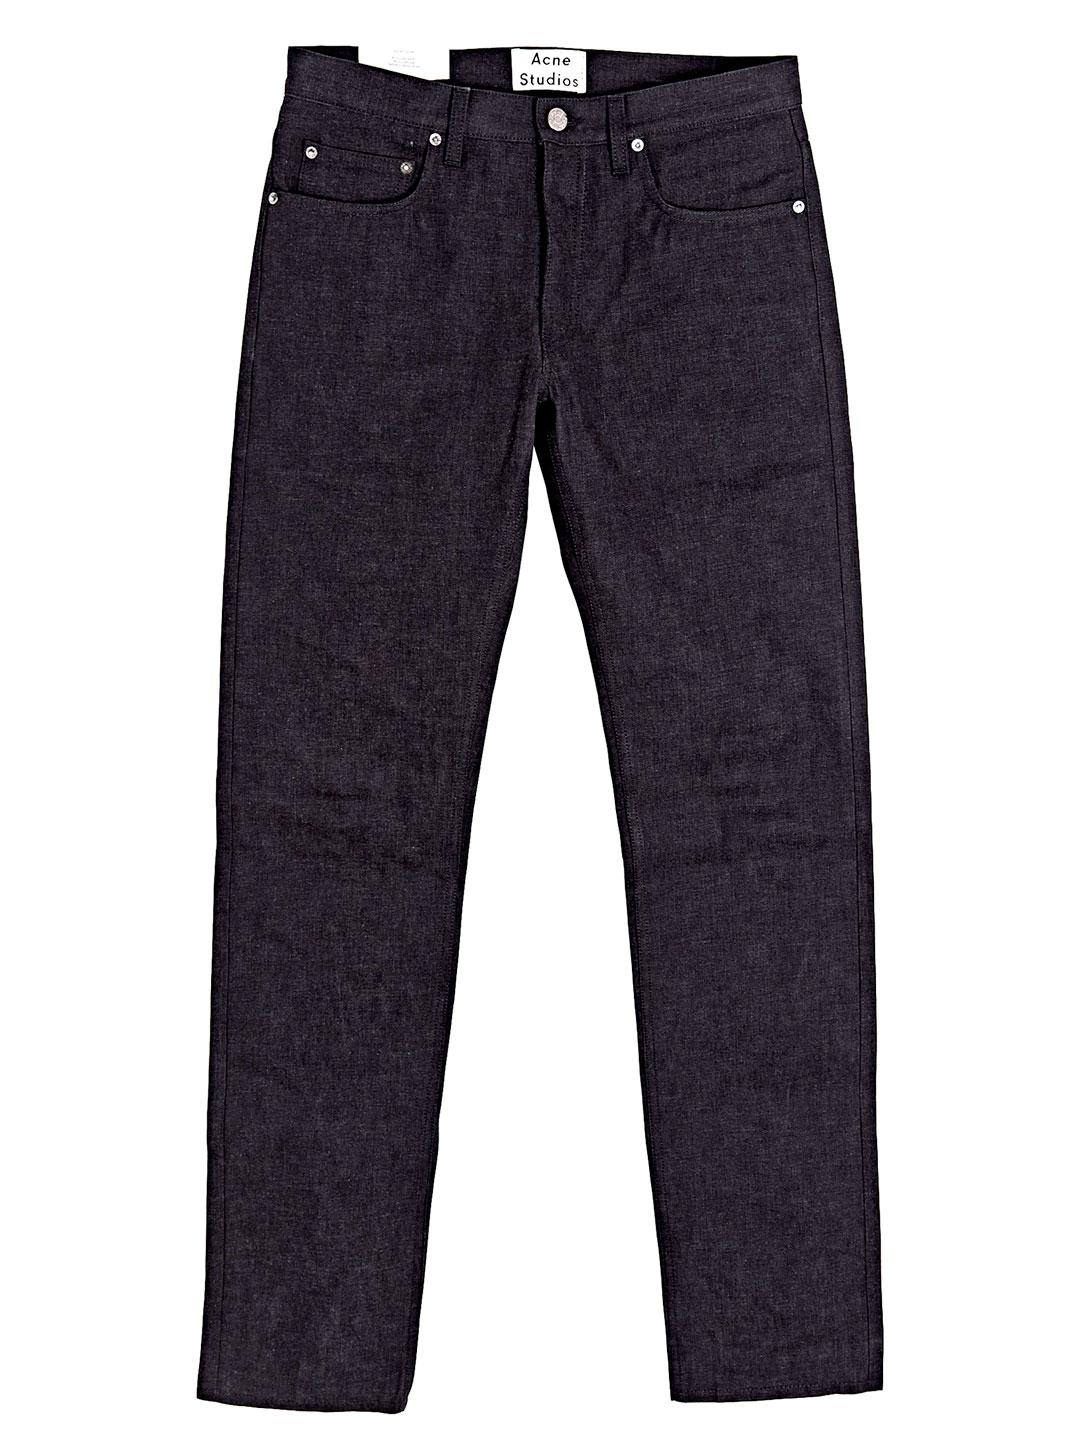 Acne Studios Denim Nolan Raw Jeans in Black for Men